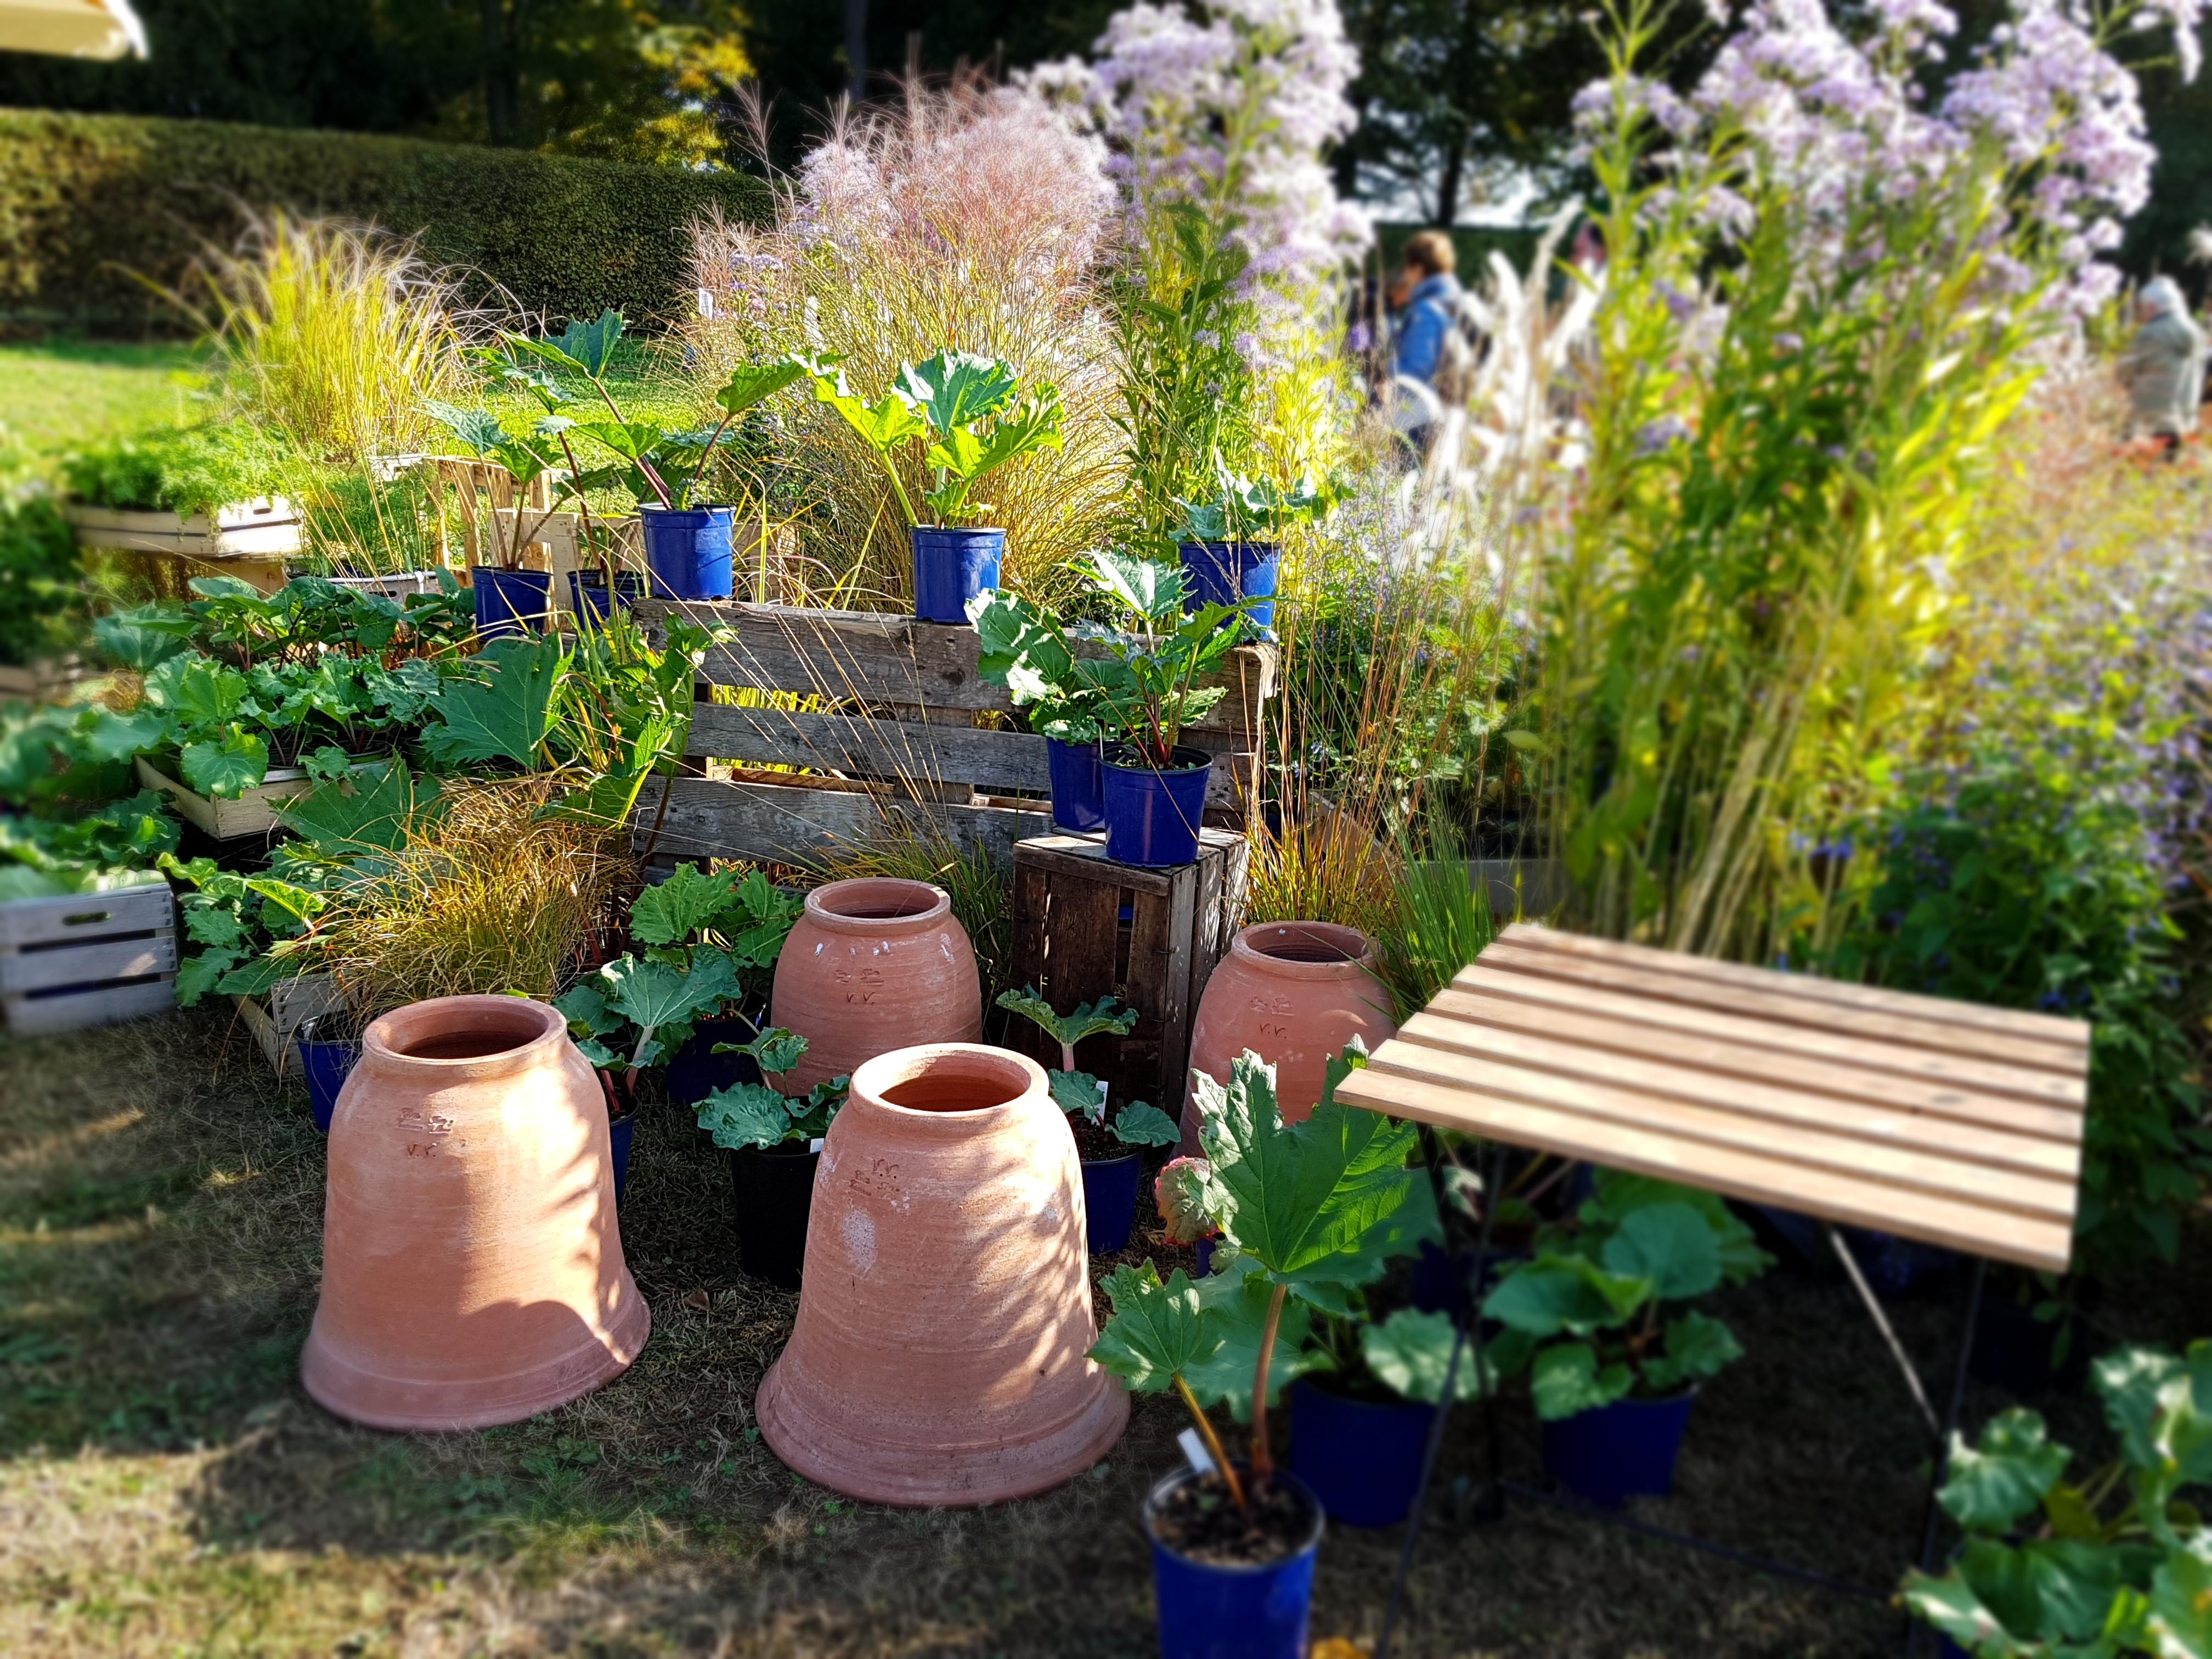 Mostre mercato 2017 giardinaggio florovivaismo fiori - Fiera giardinaggio ...